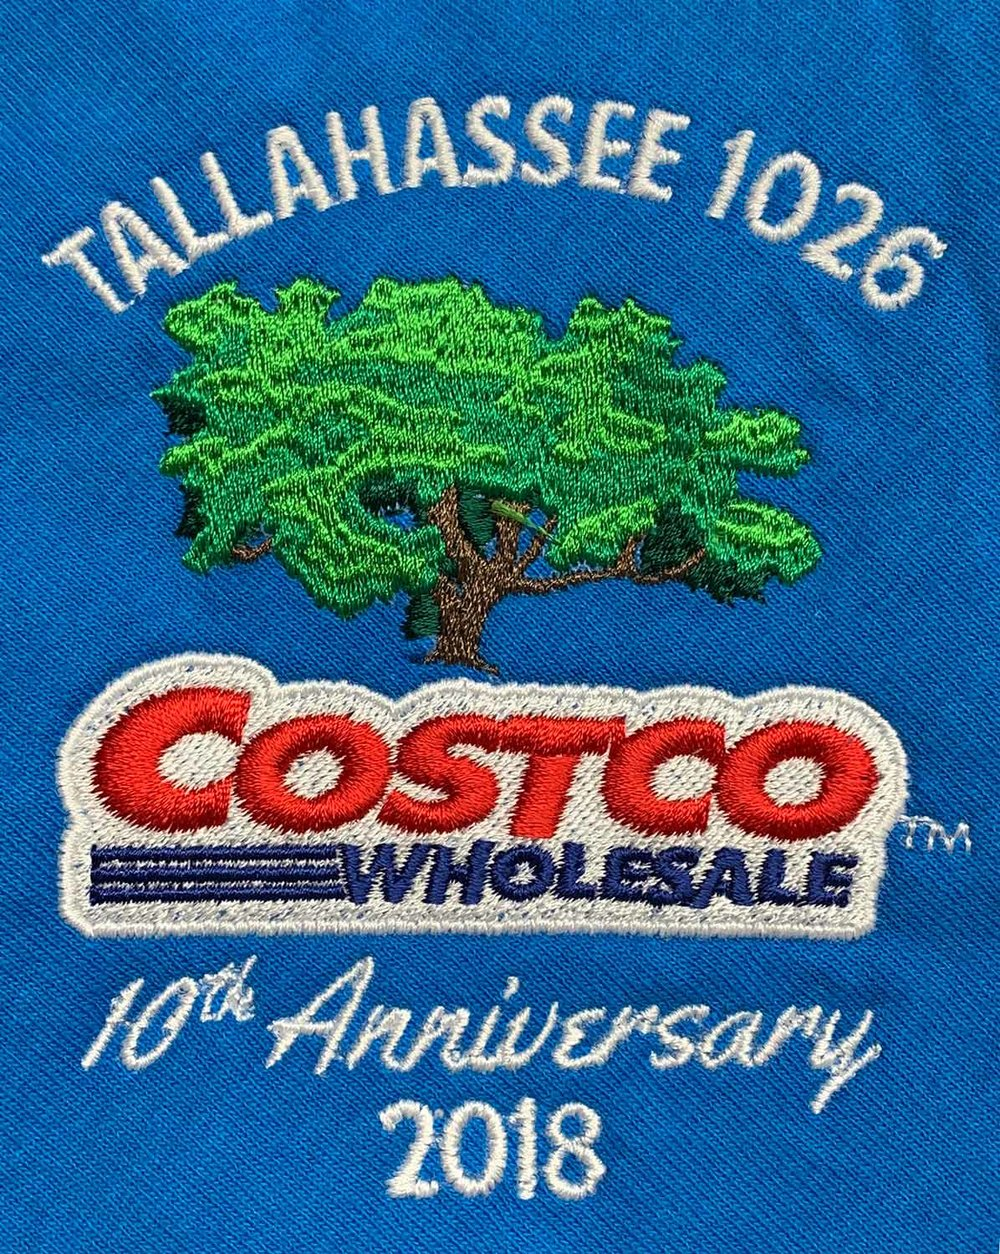 KYC_COSTCO-WHOLESALE_web.jpg